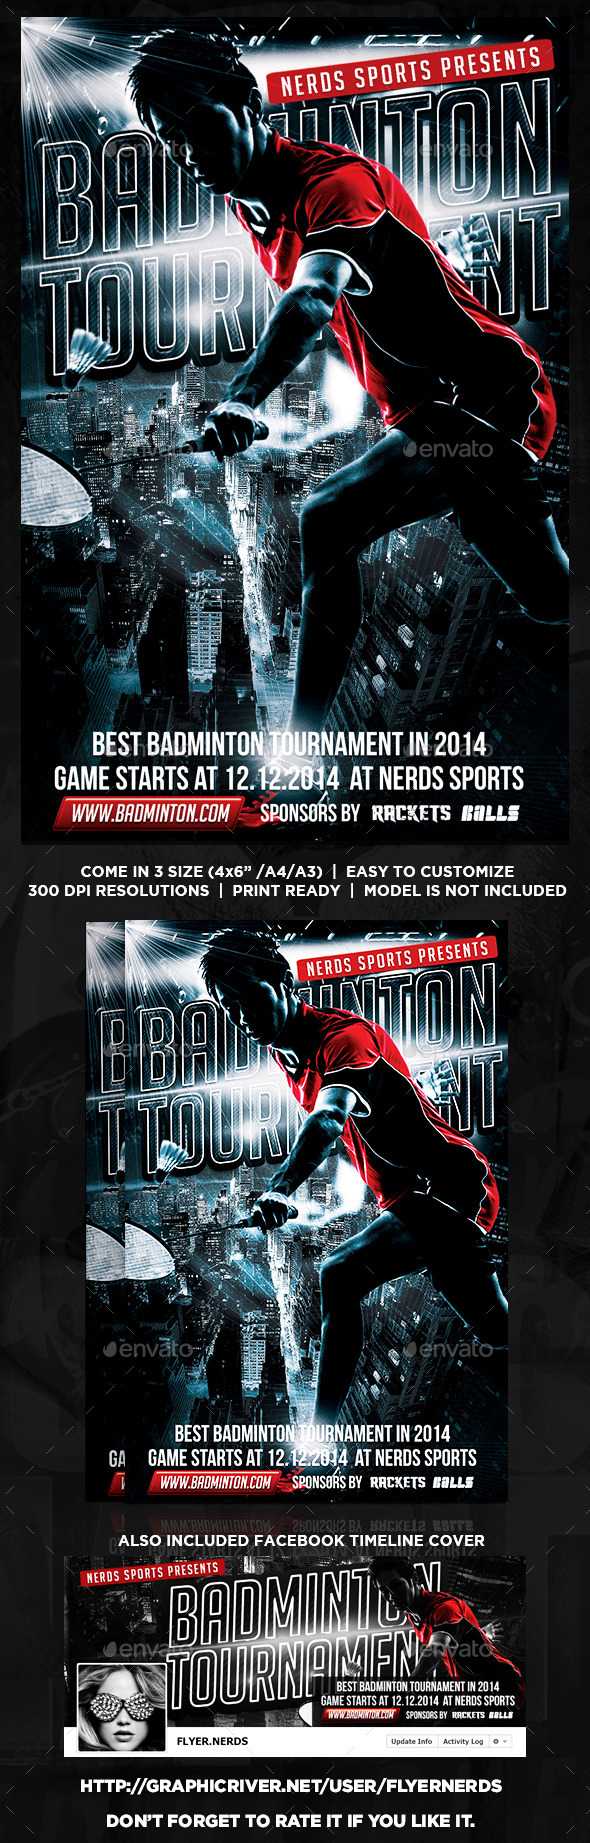 GraphicRiver Badminton Tournament Flyer 8798325